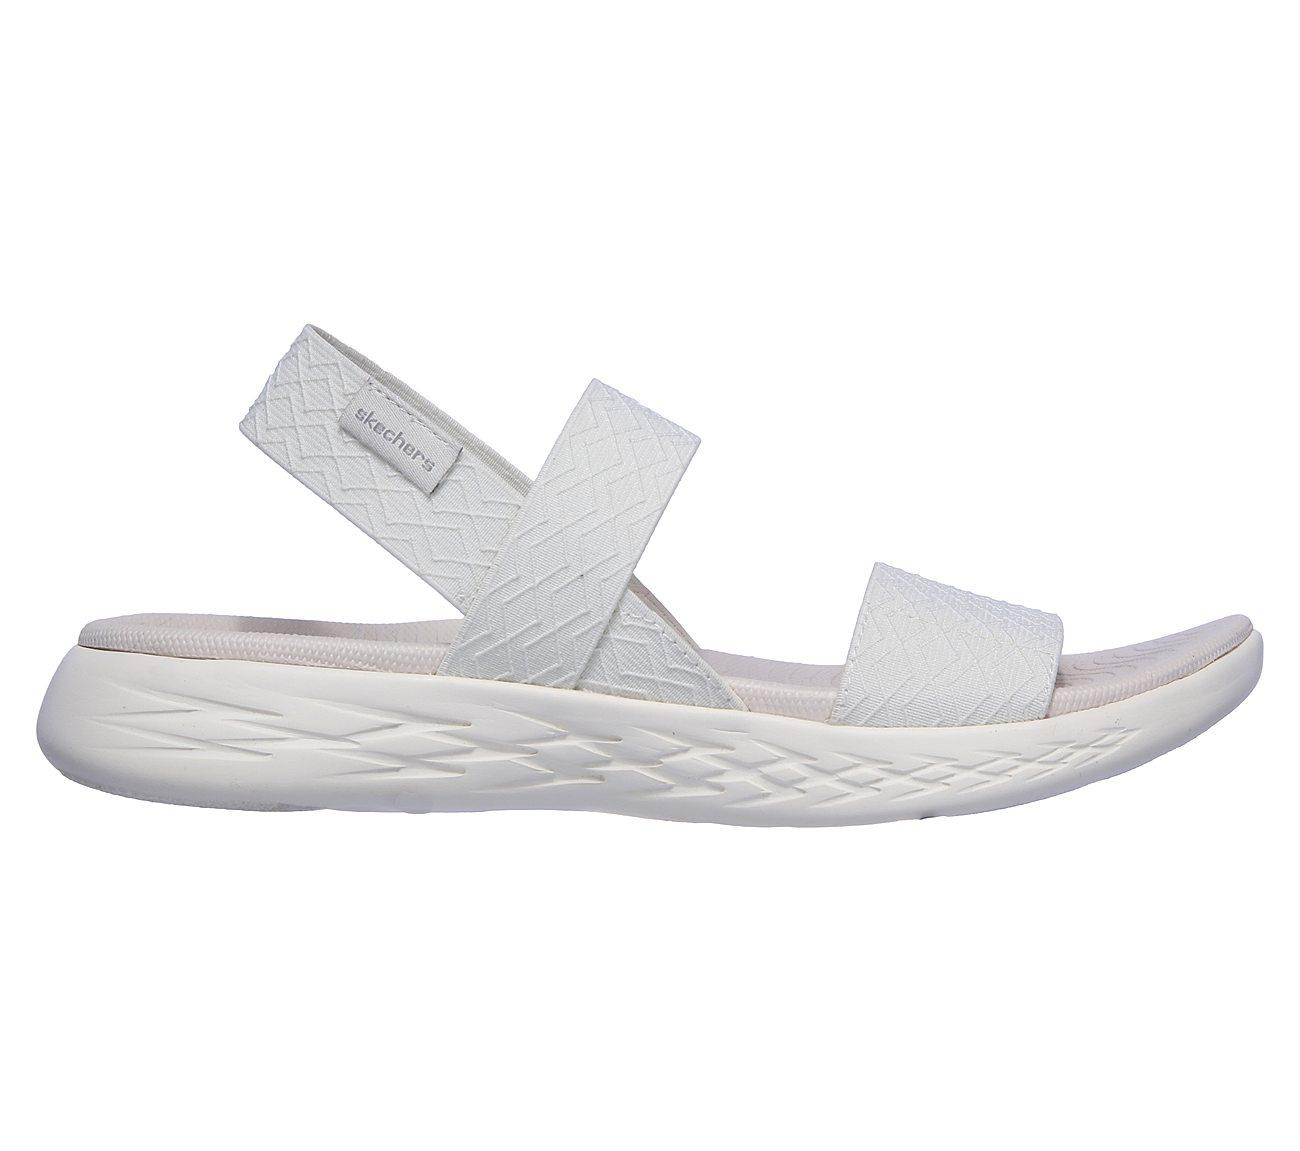 Buy Skechers Skechers On The Go 600 Girls Trip Skechers Performance Shoes